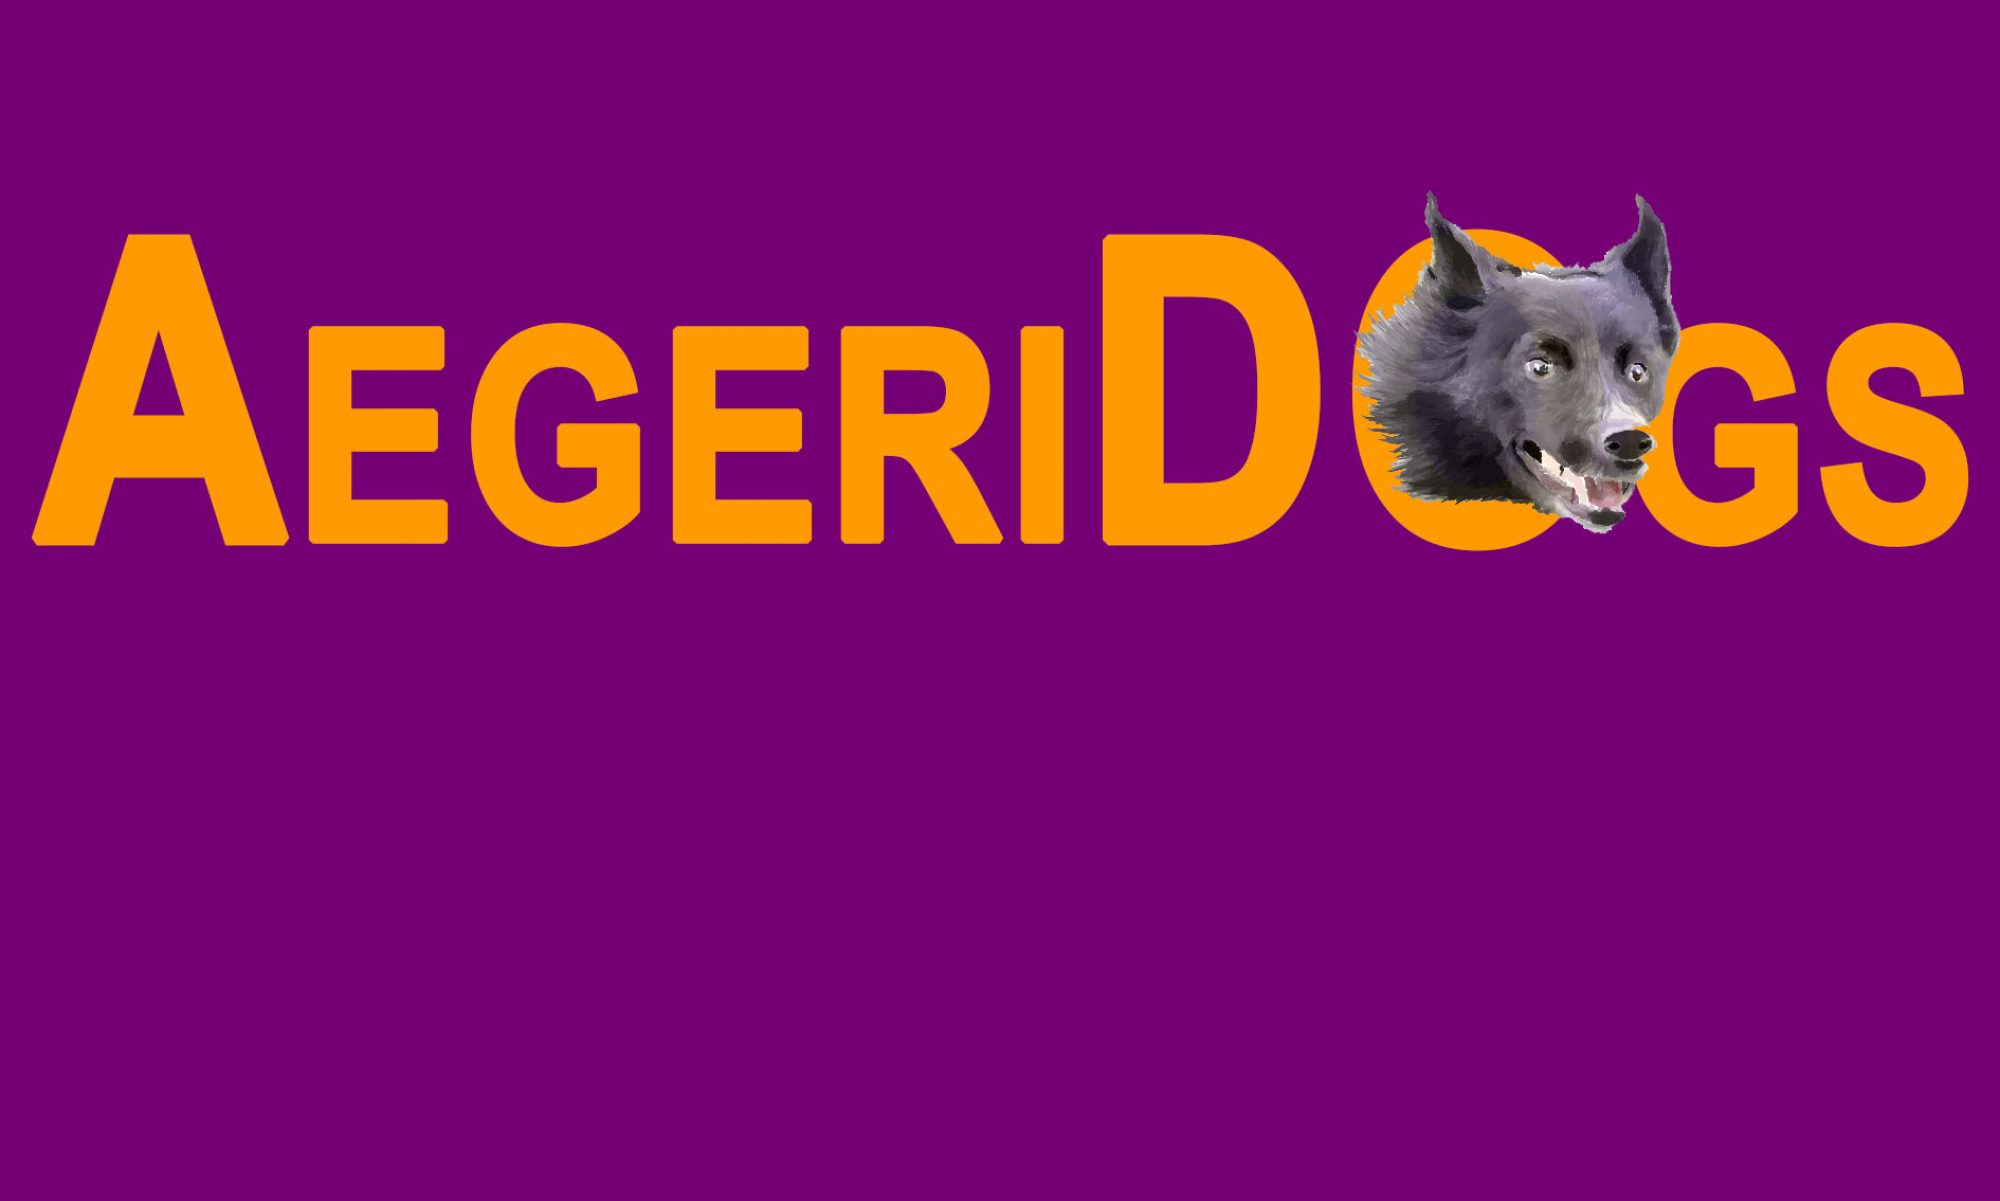 Aegeridogs